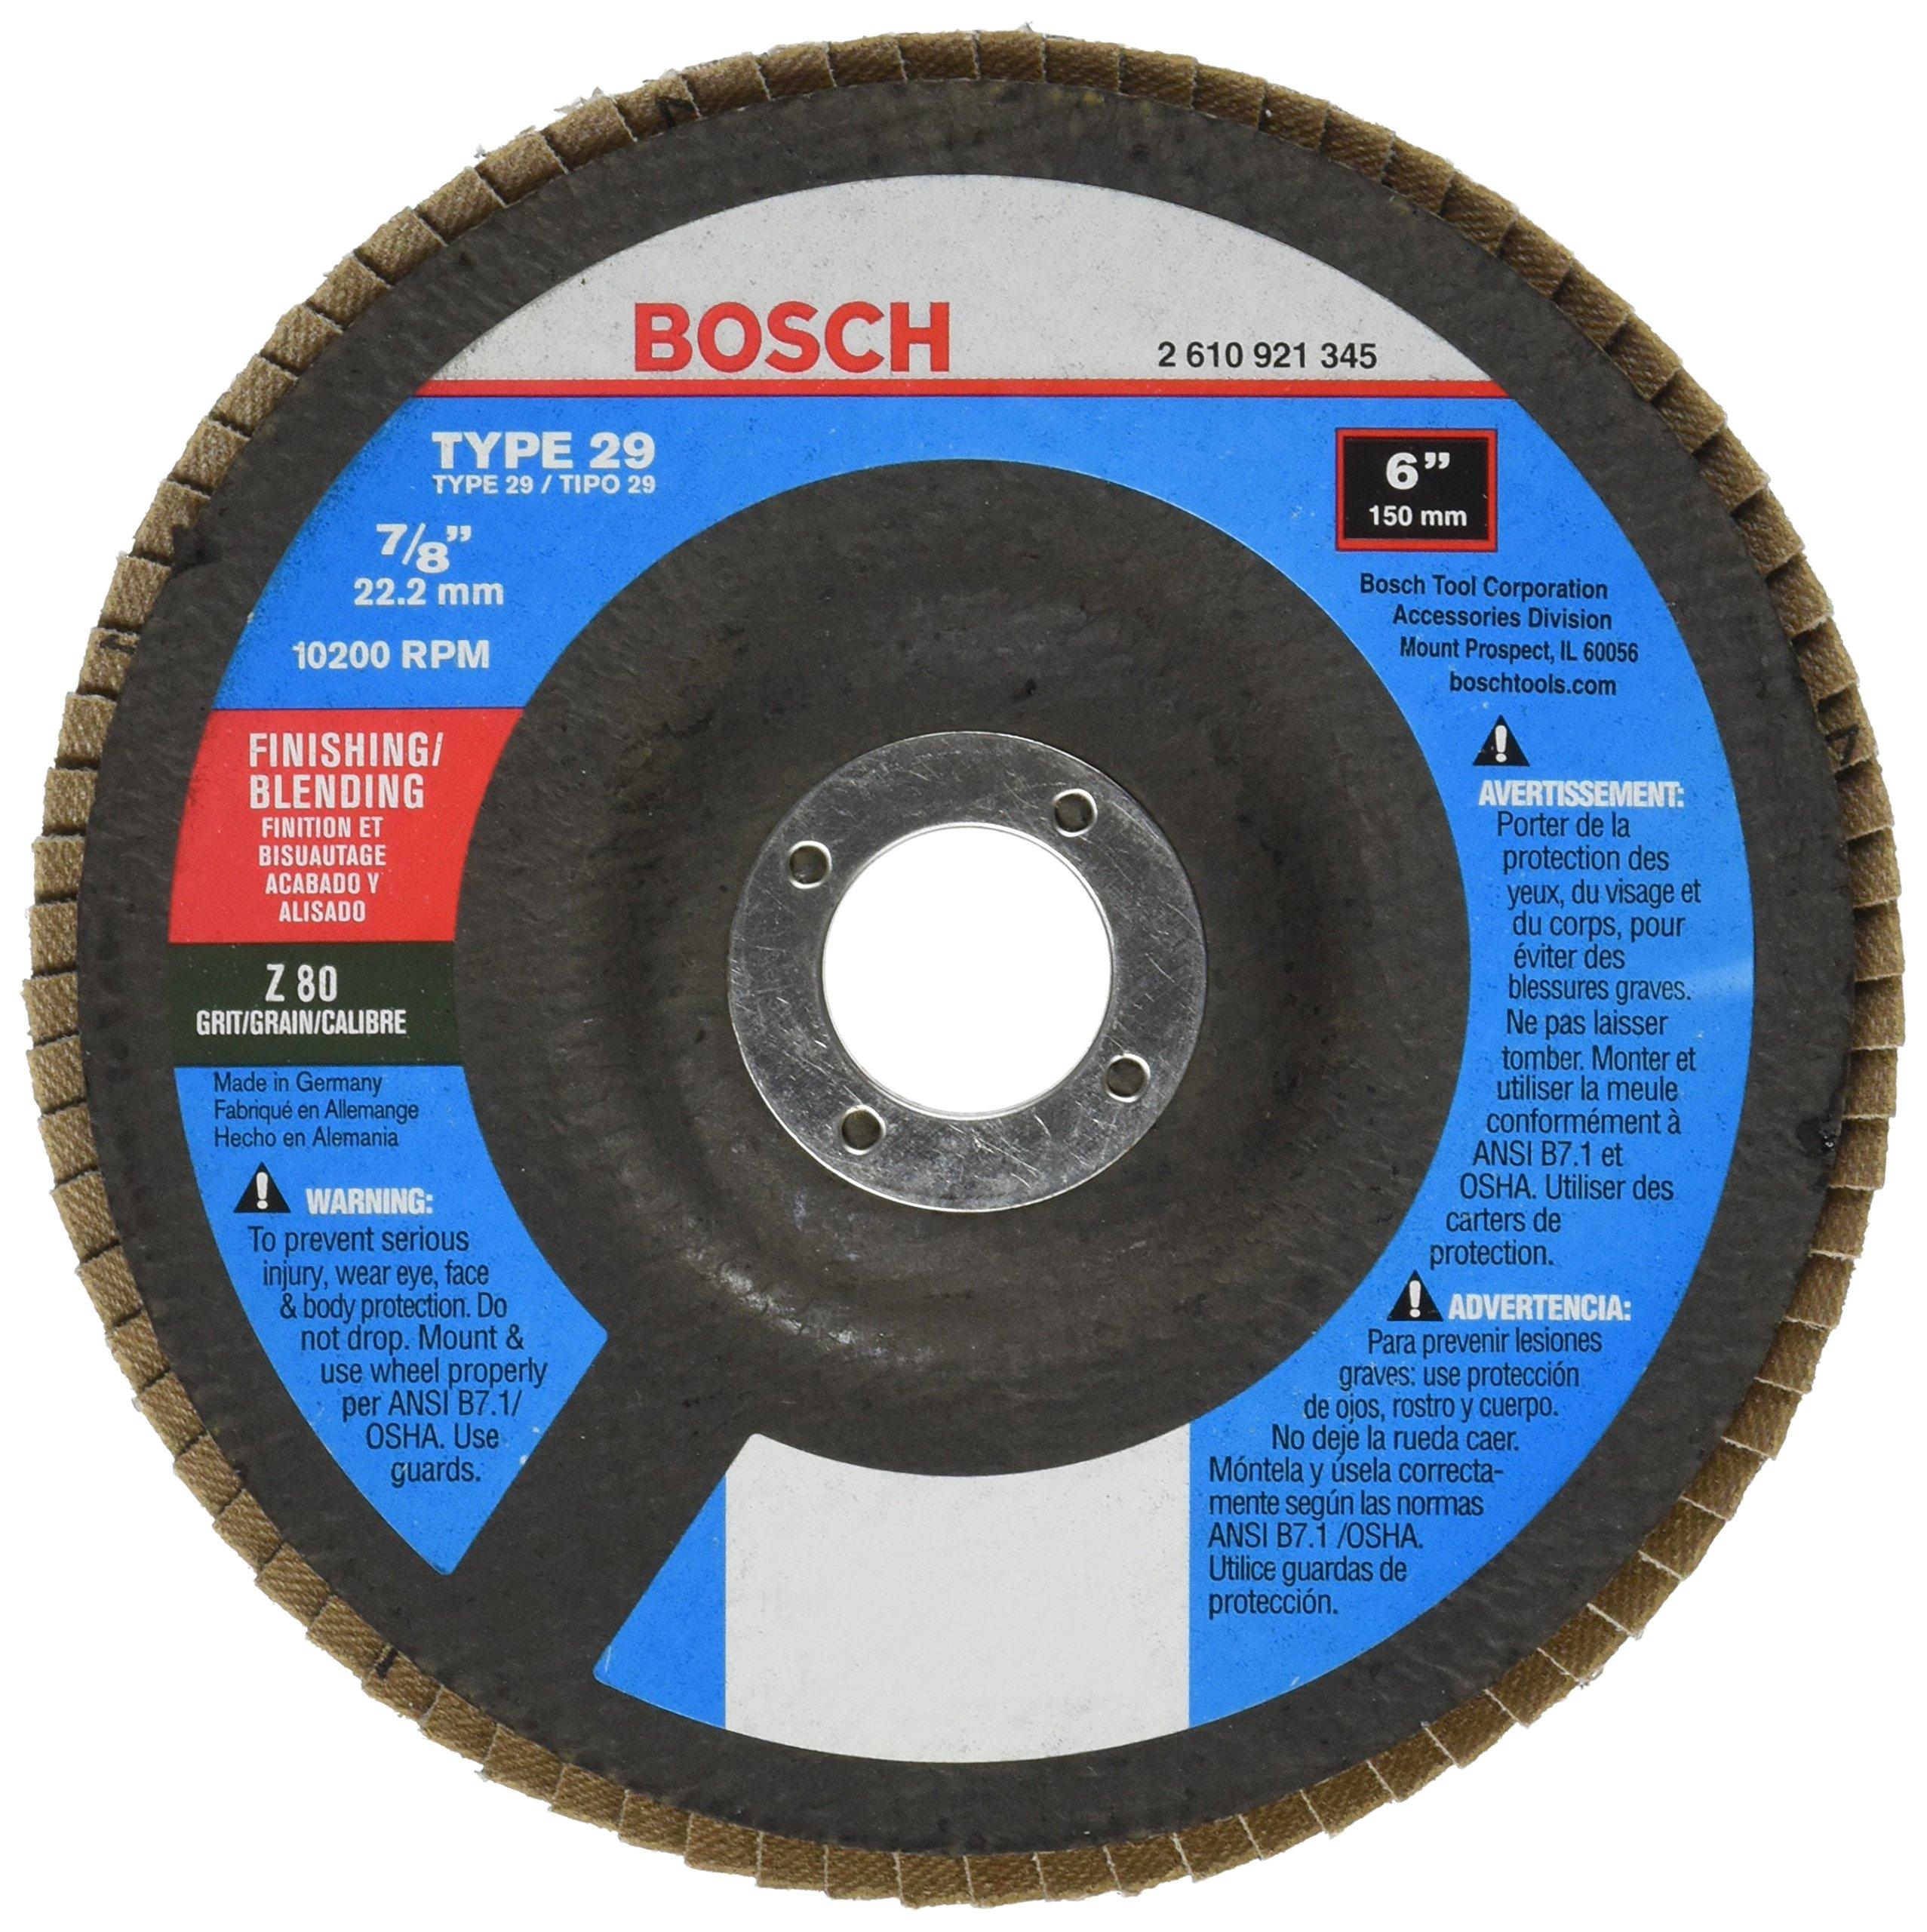 Bosch FD2960080 Type 29 80-Grit Flap Disc, 6-Inch 7/8-Inch Arbor